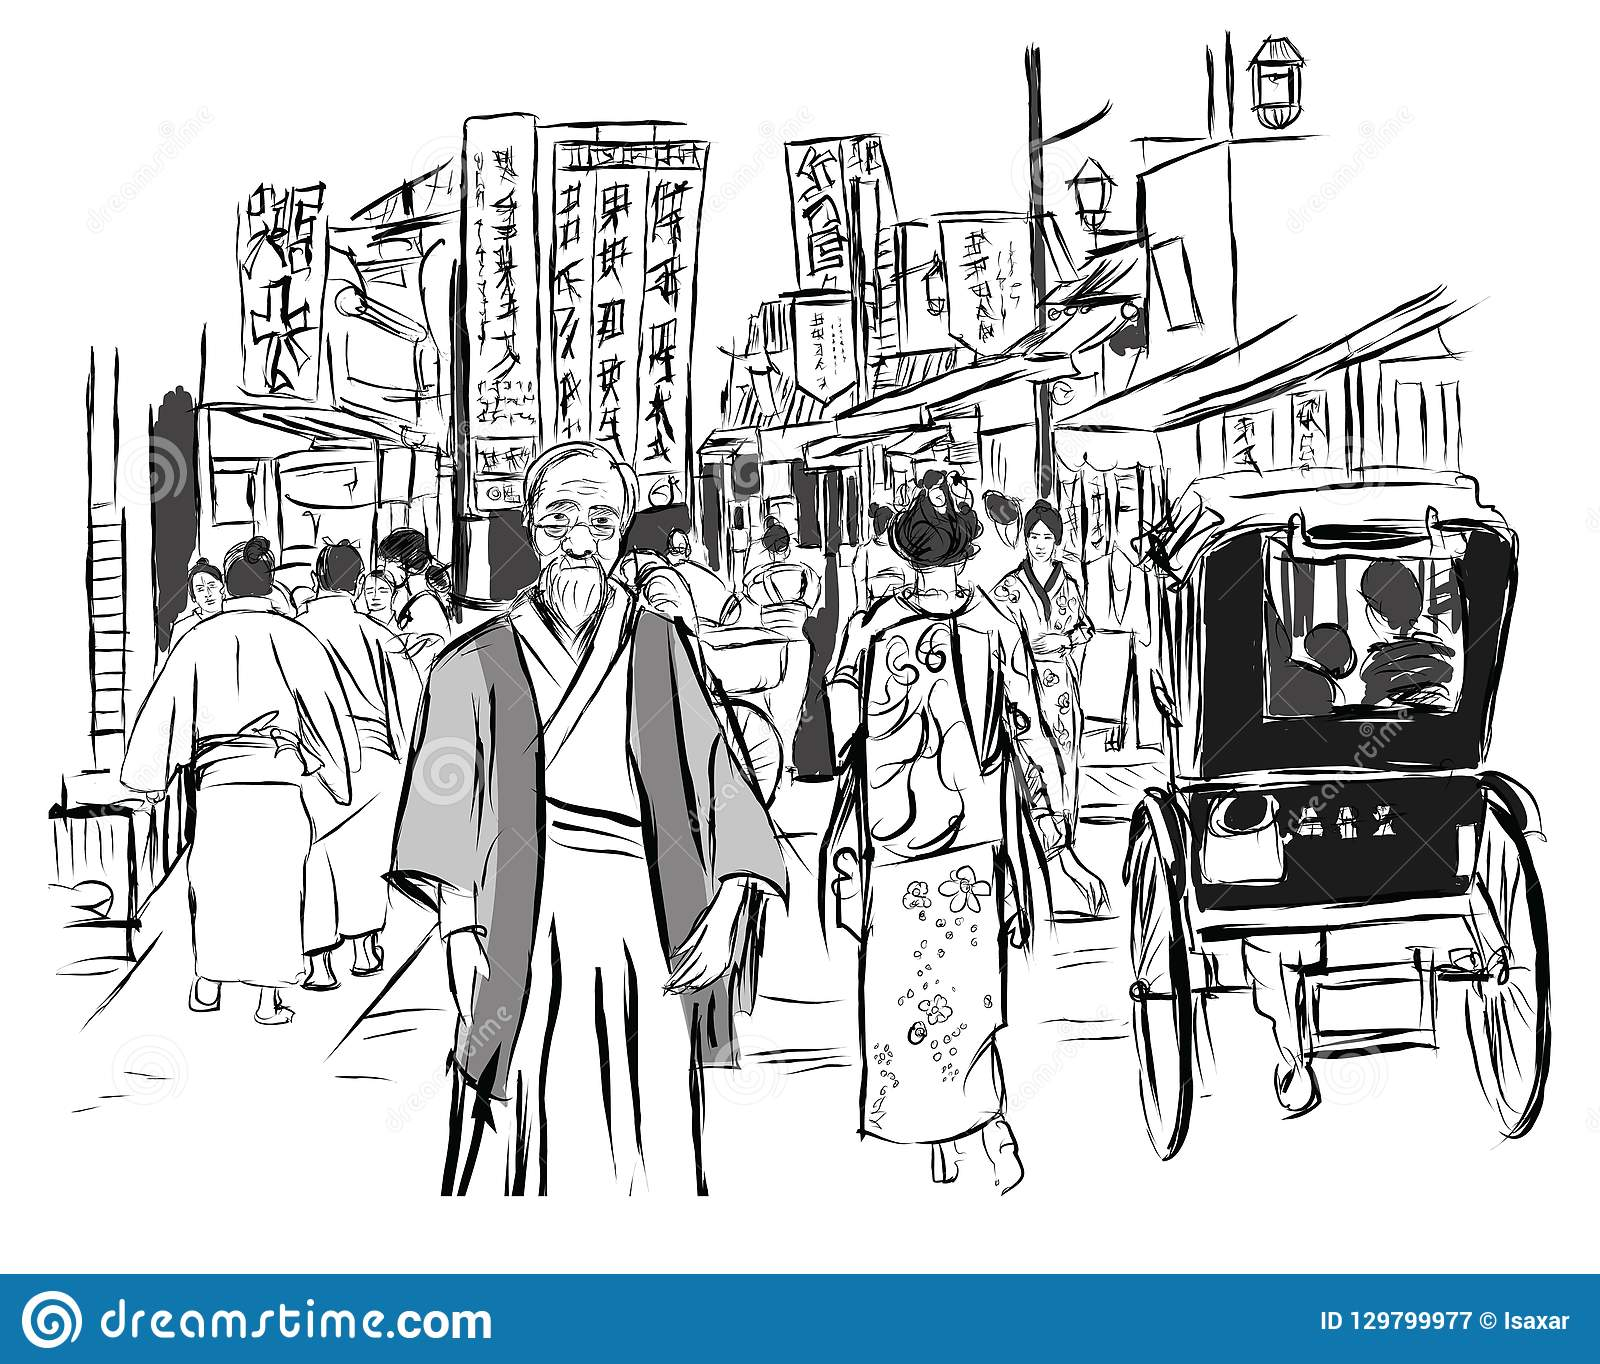 Straat in Tokyo met mensen in traditionele kleding